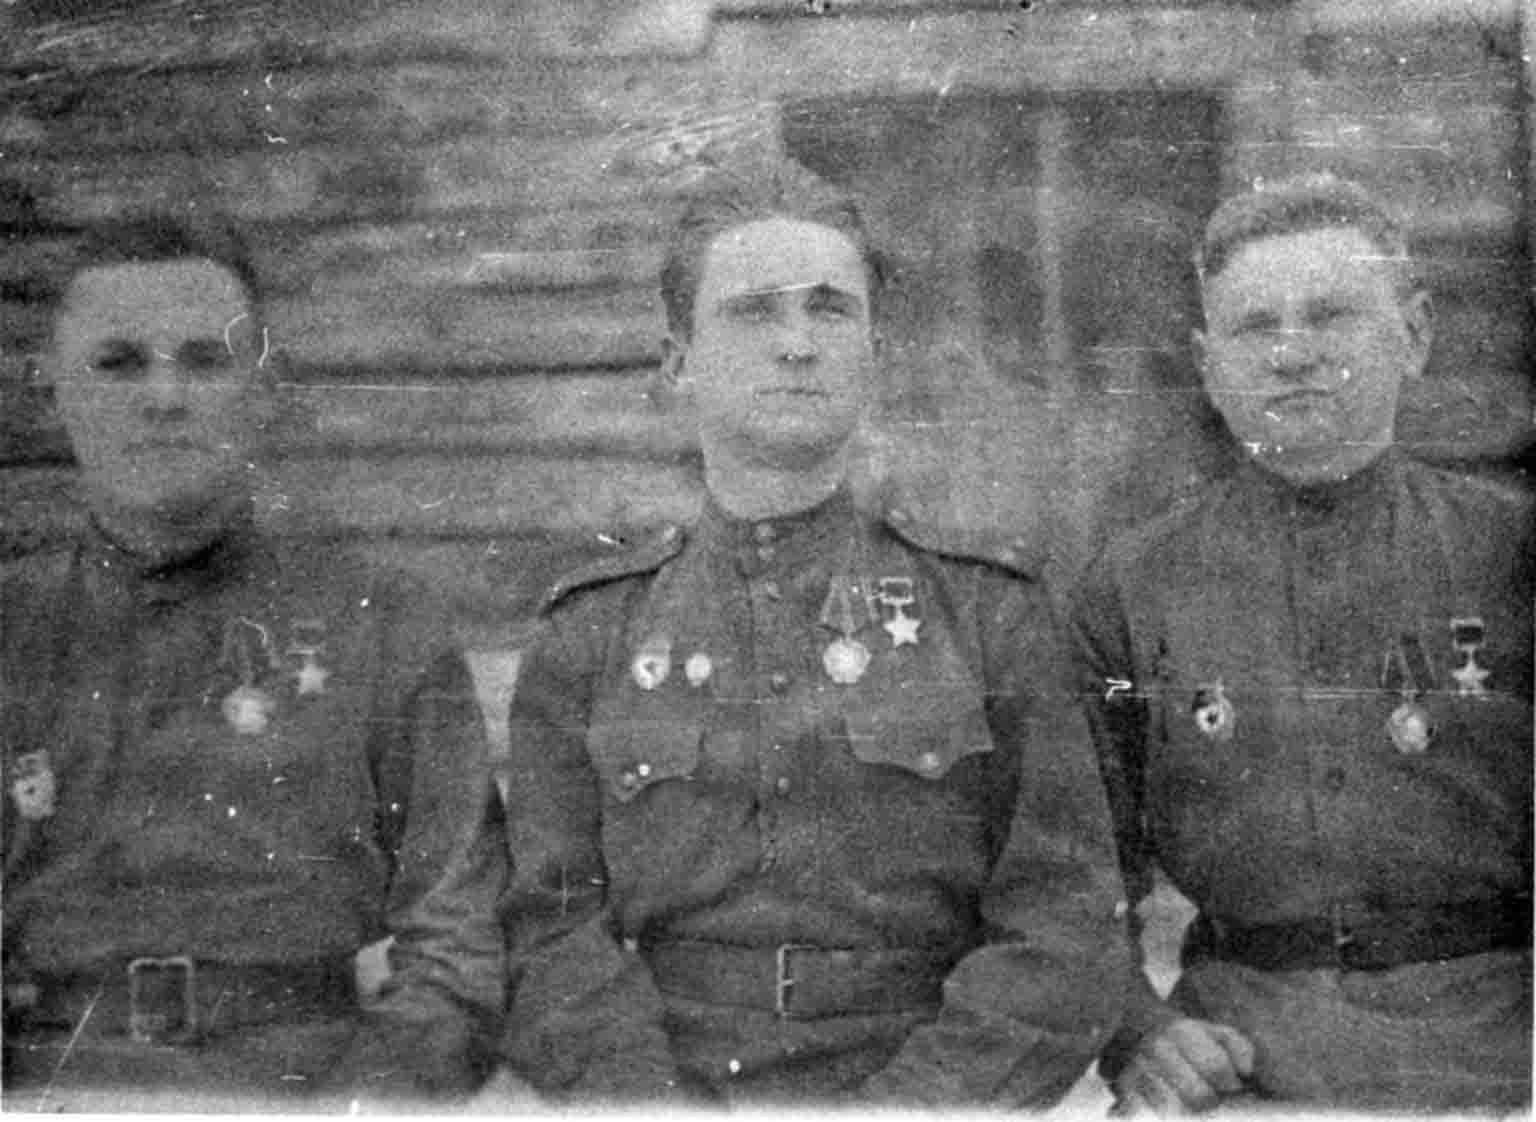 Heroe of the Soviet Union